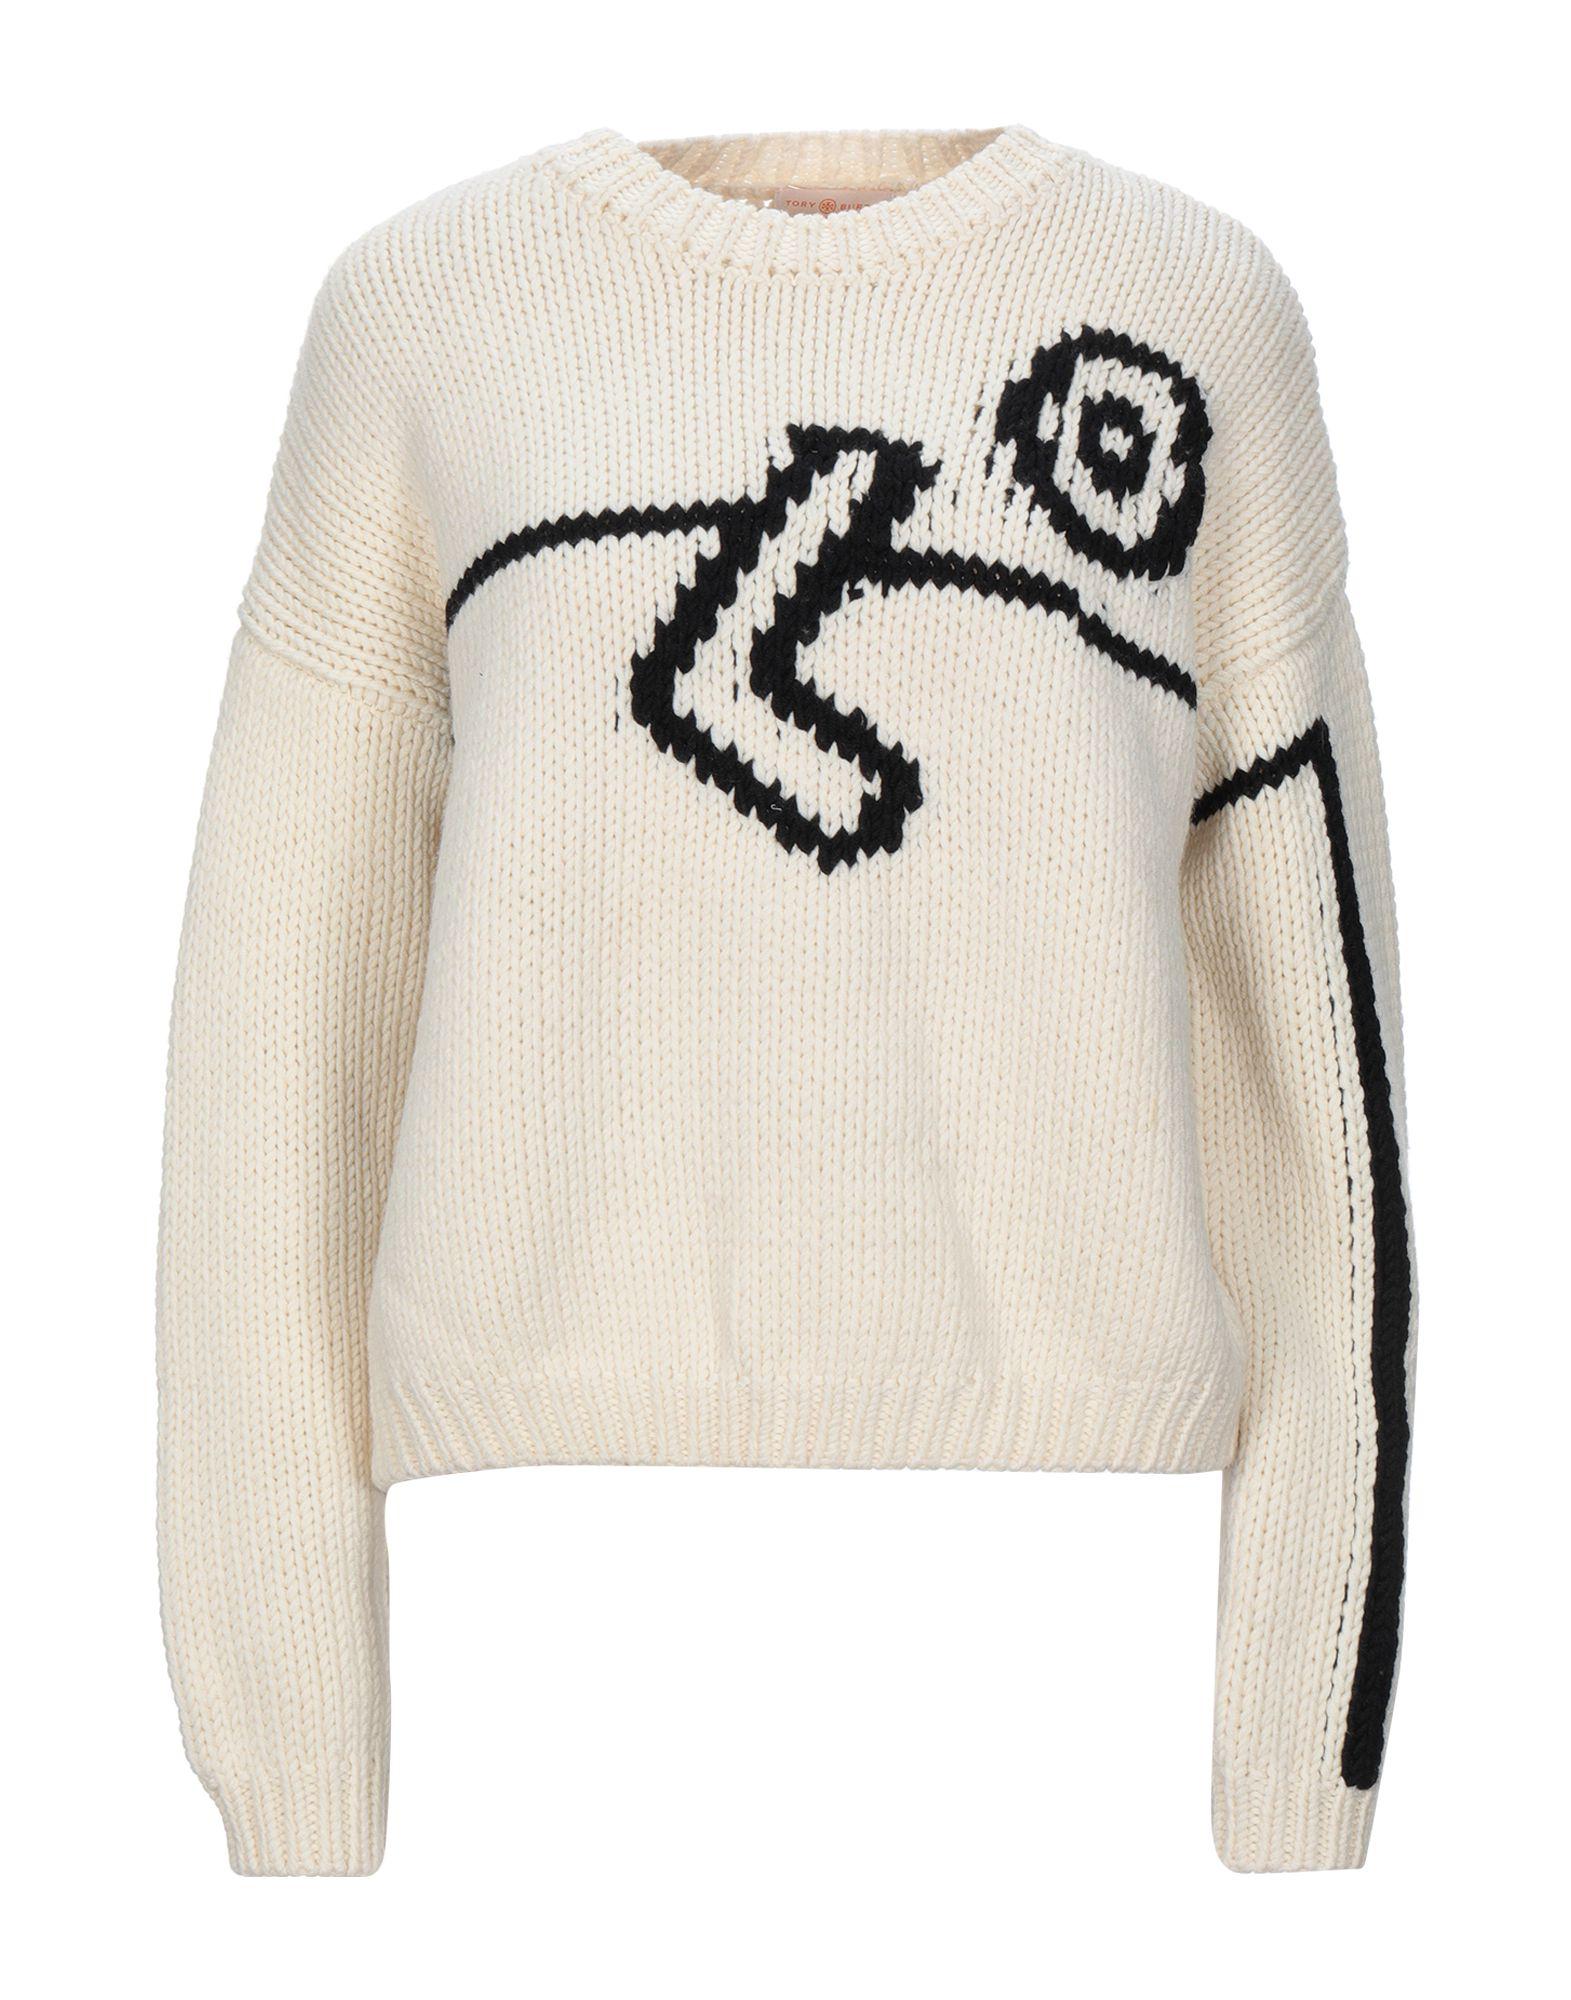 TORY BURCH Свитер tory burch свитер